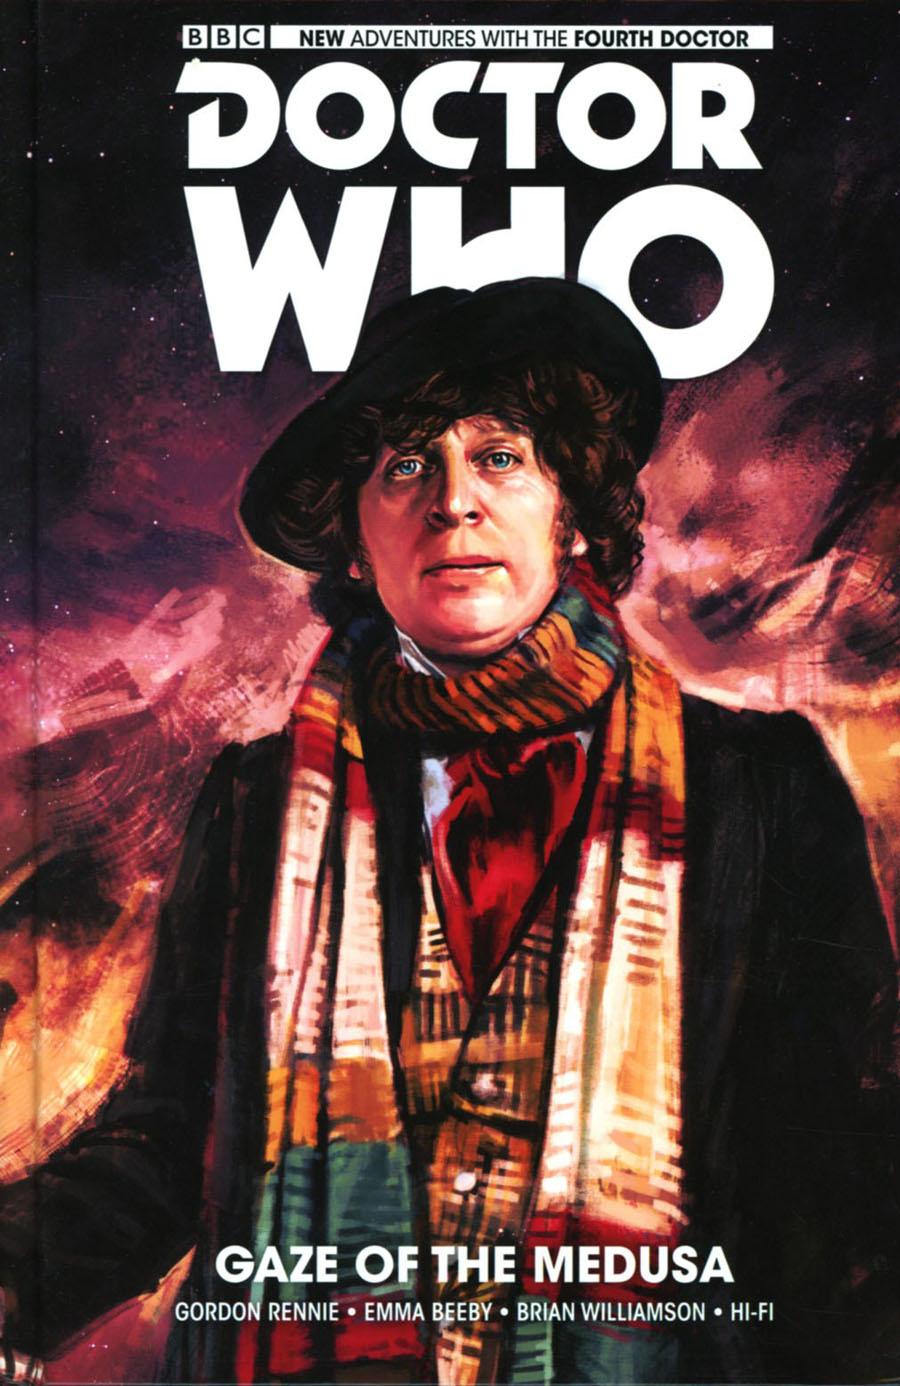 Doctor Who 4th Doctor Vol 1 Gaze Of The Medusa HC